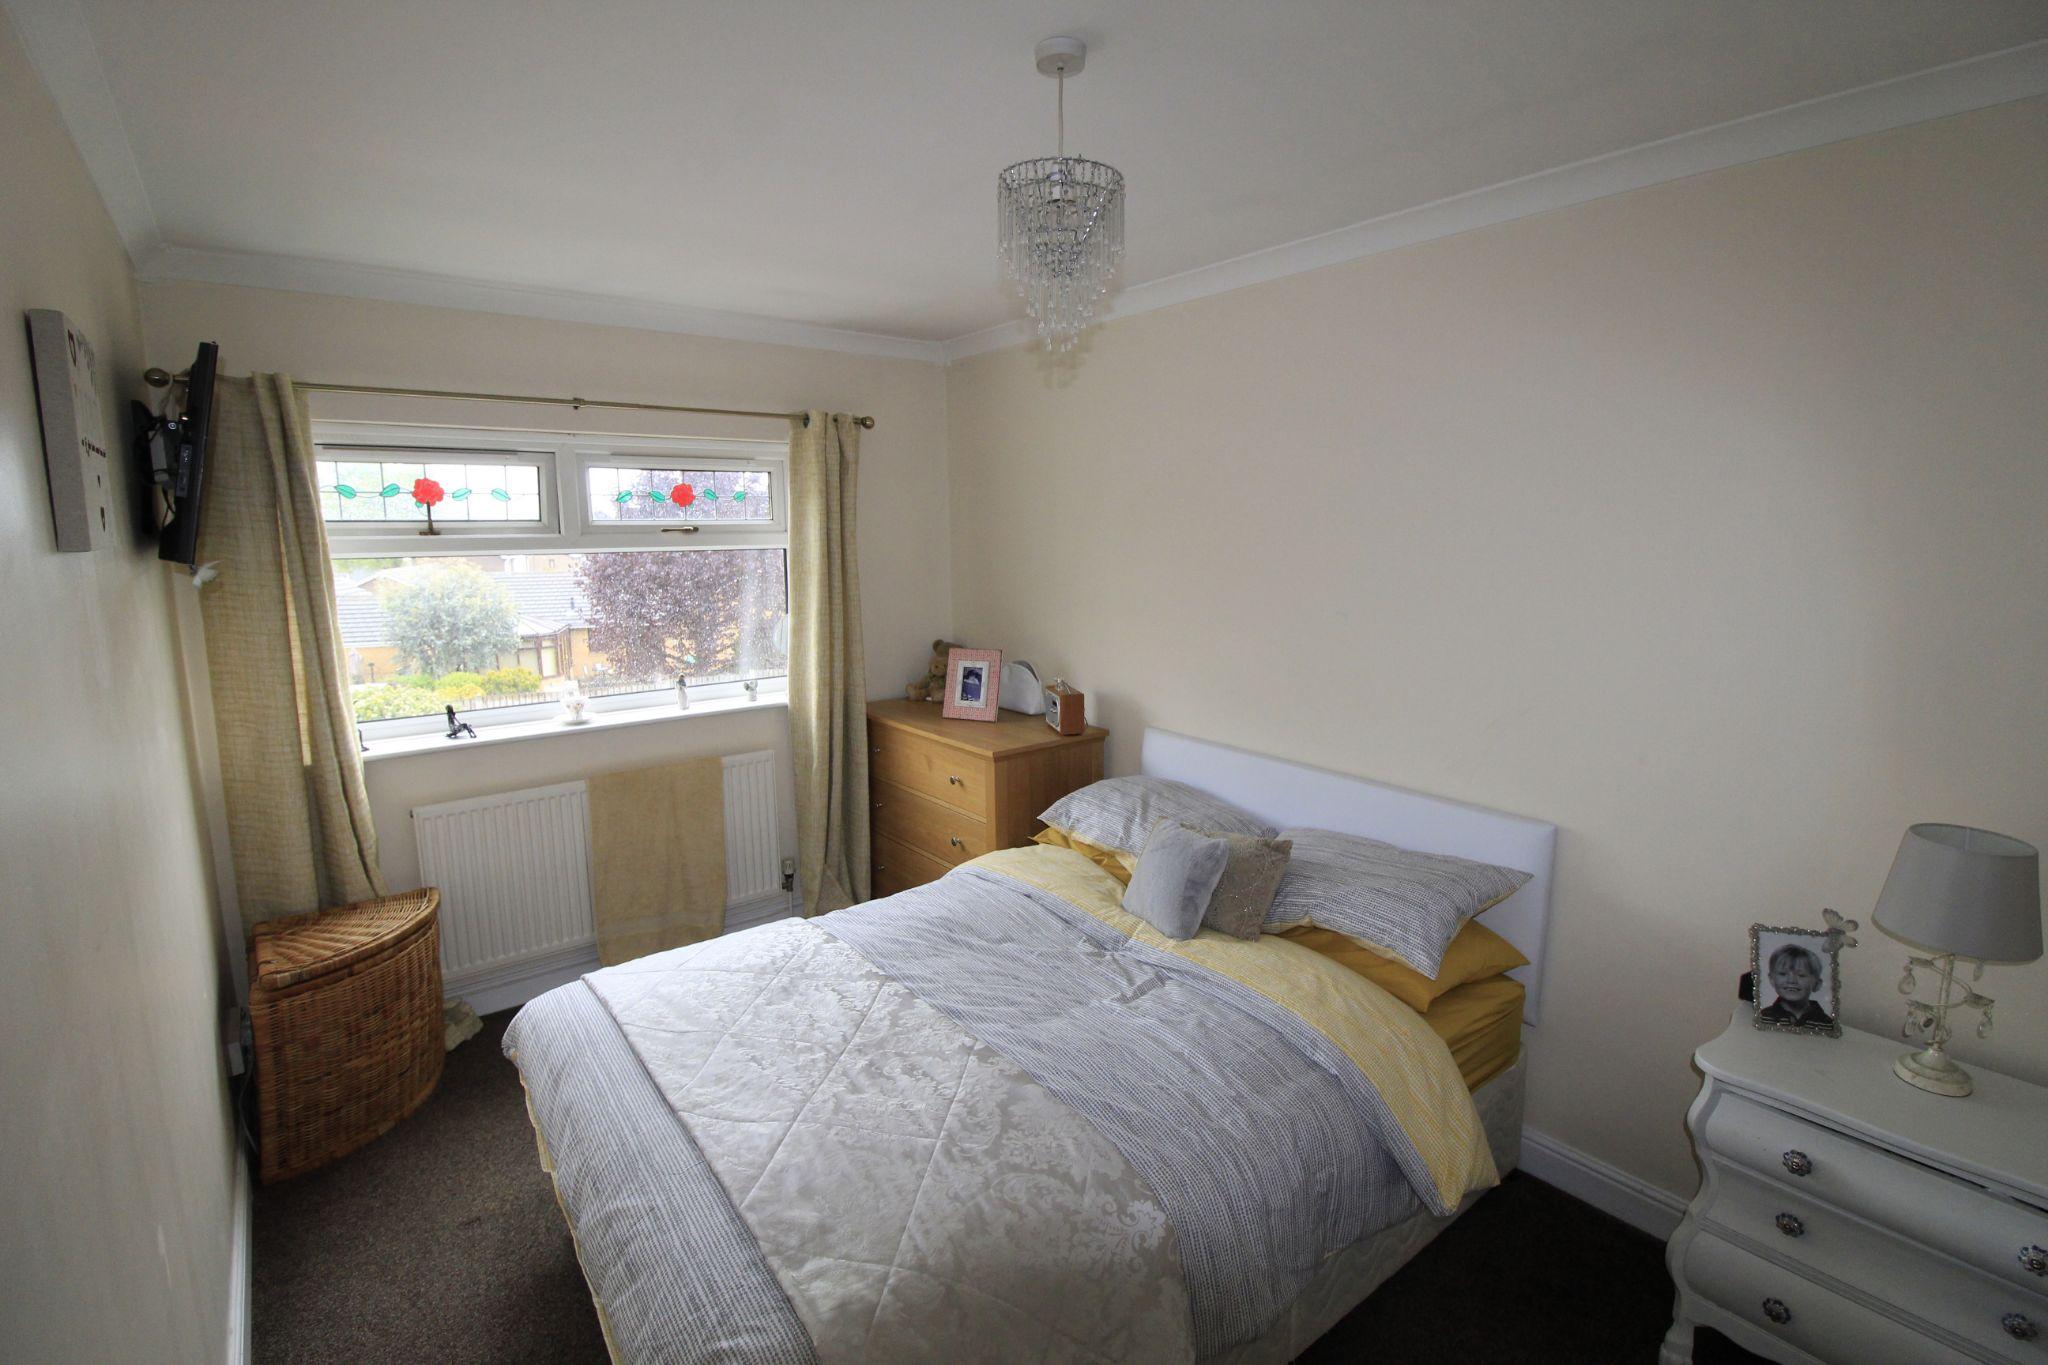 3 bedroom mid terraced house Let in Brighouse - Bedroom 1